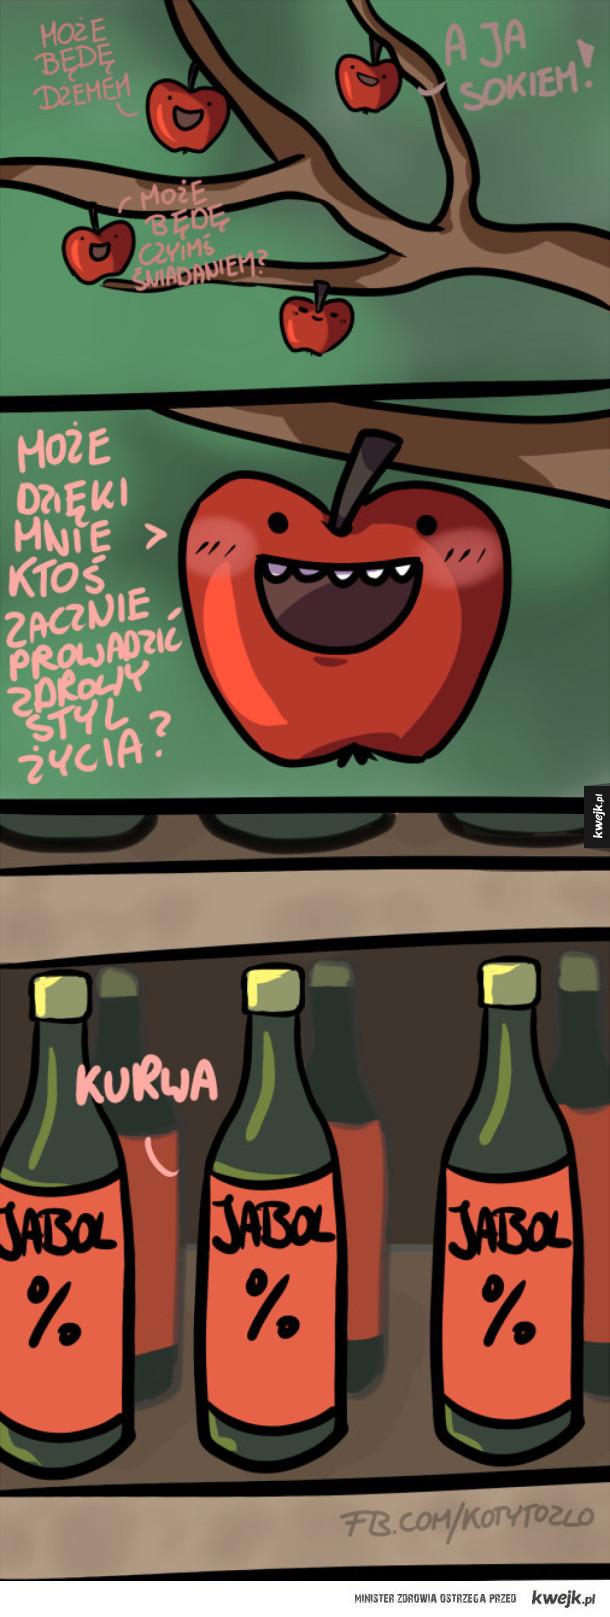 Komiks o jabłkach